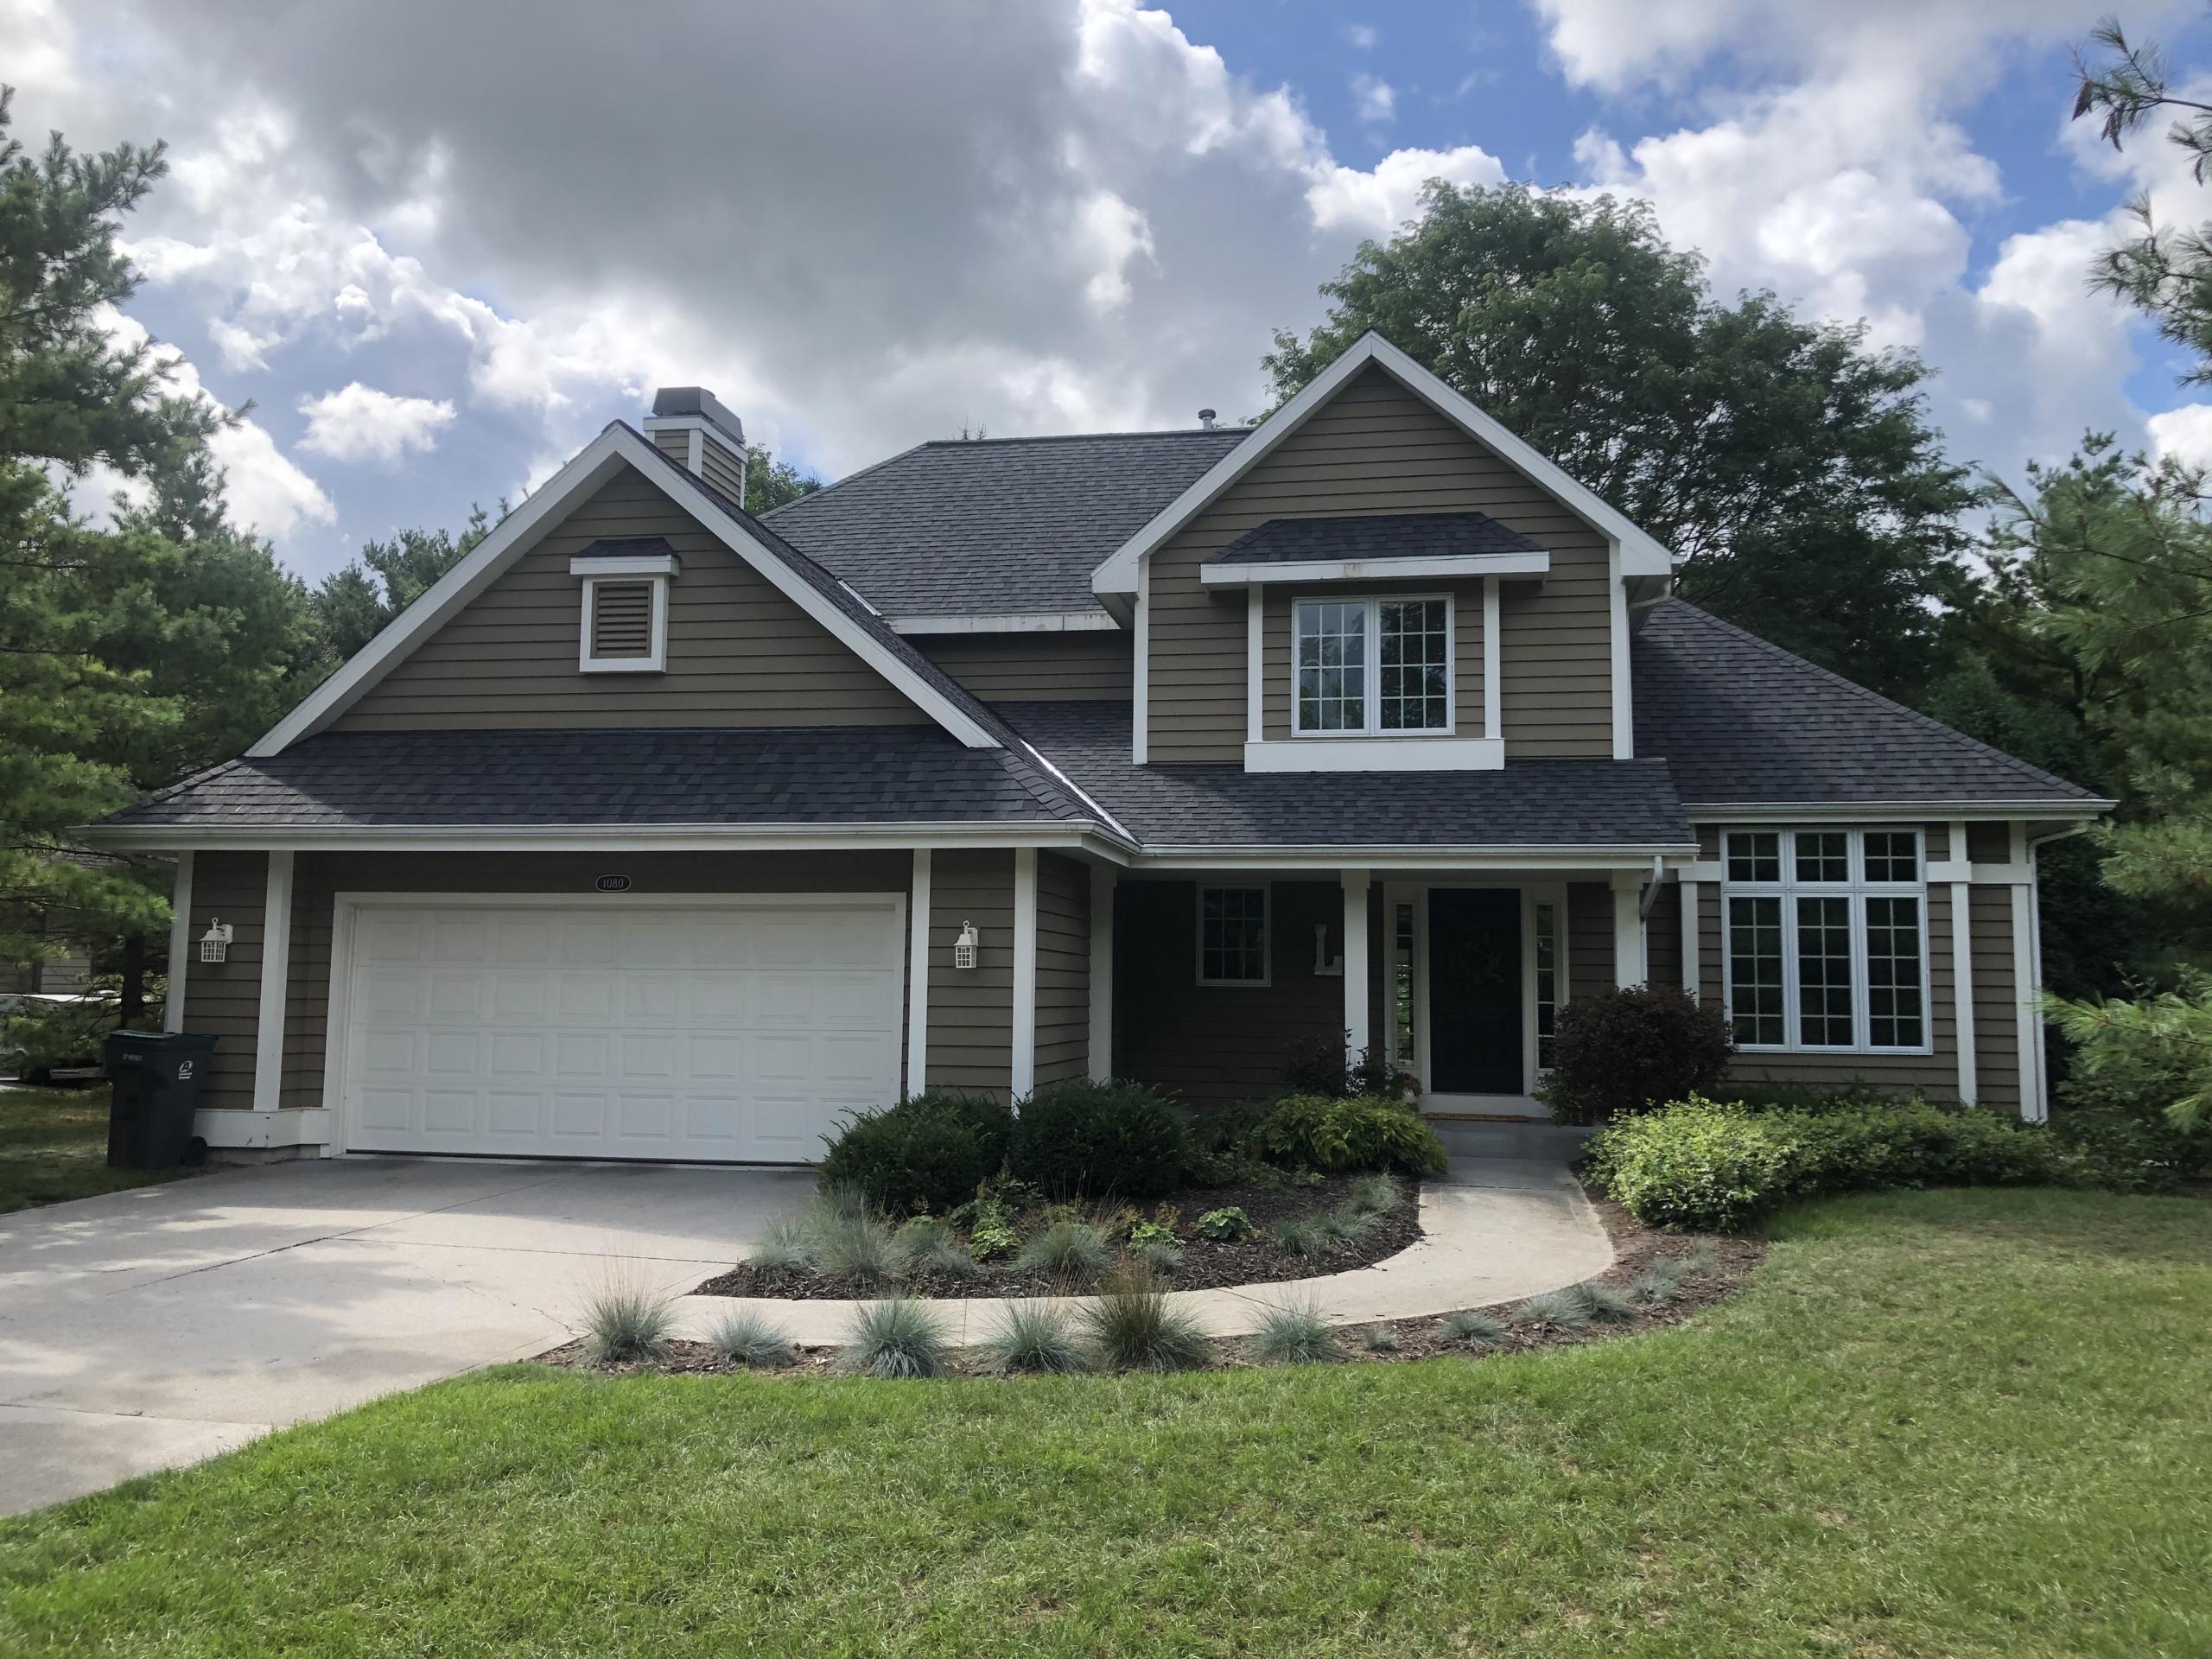 Wisconsin Roofing LLC | Kohler WI | CertainTeed Landmark Pro Moire Black | Re-roof | Gutter Guards